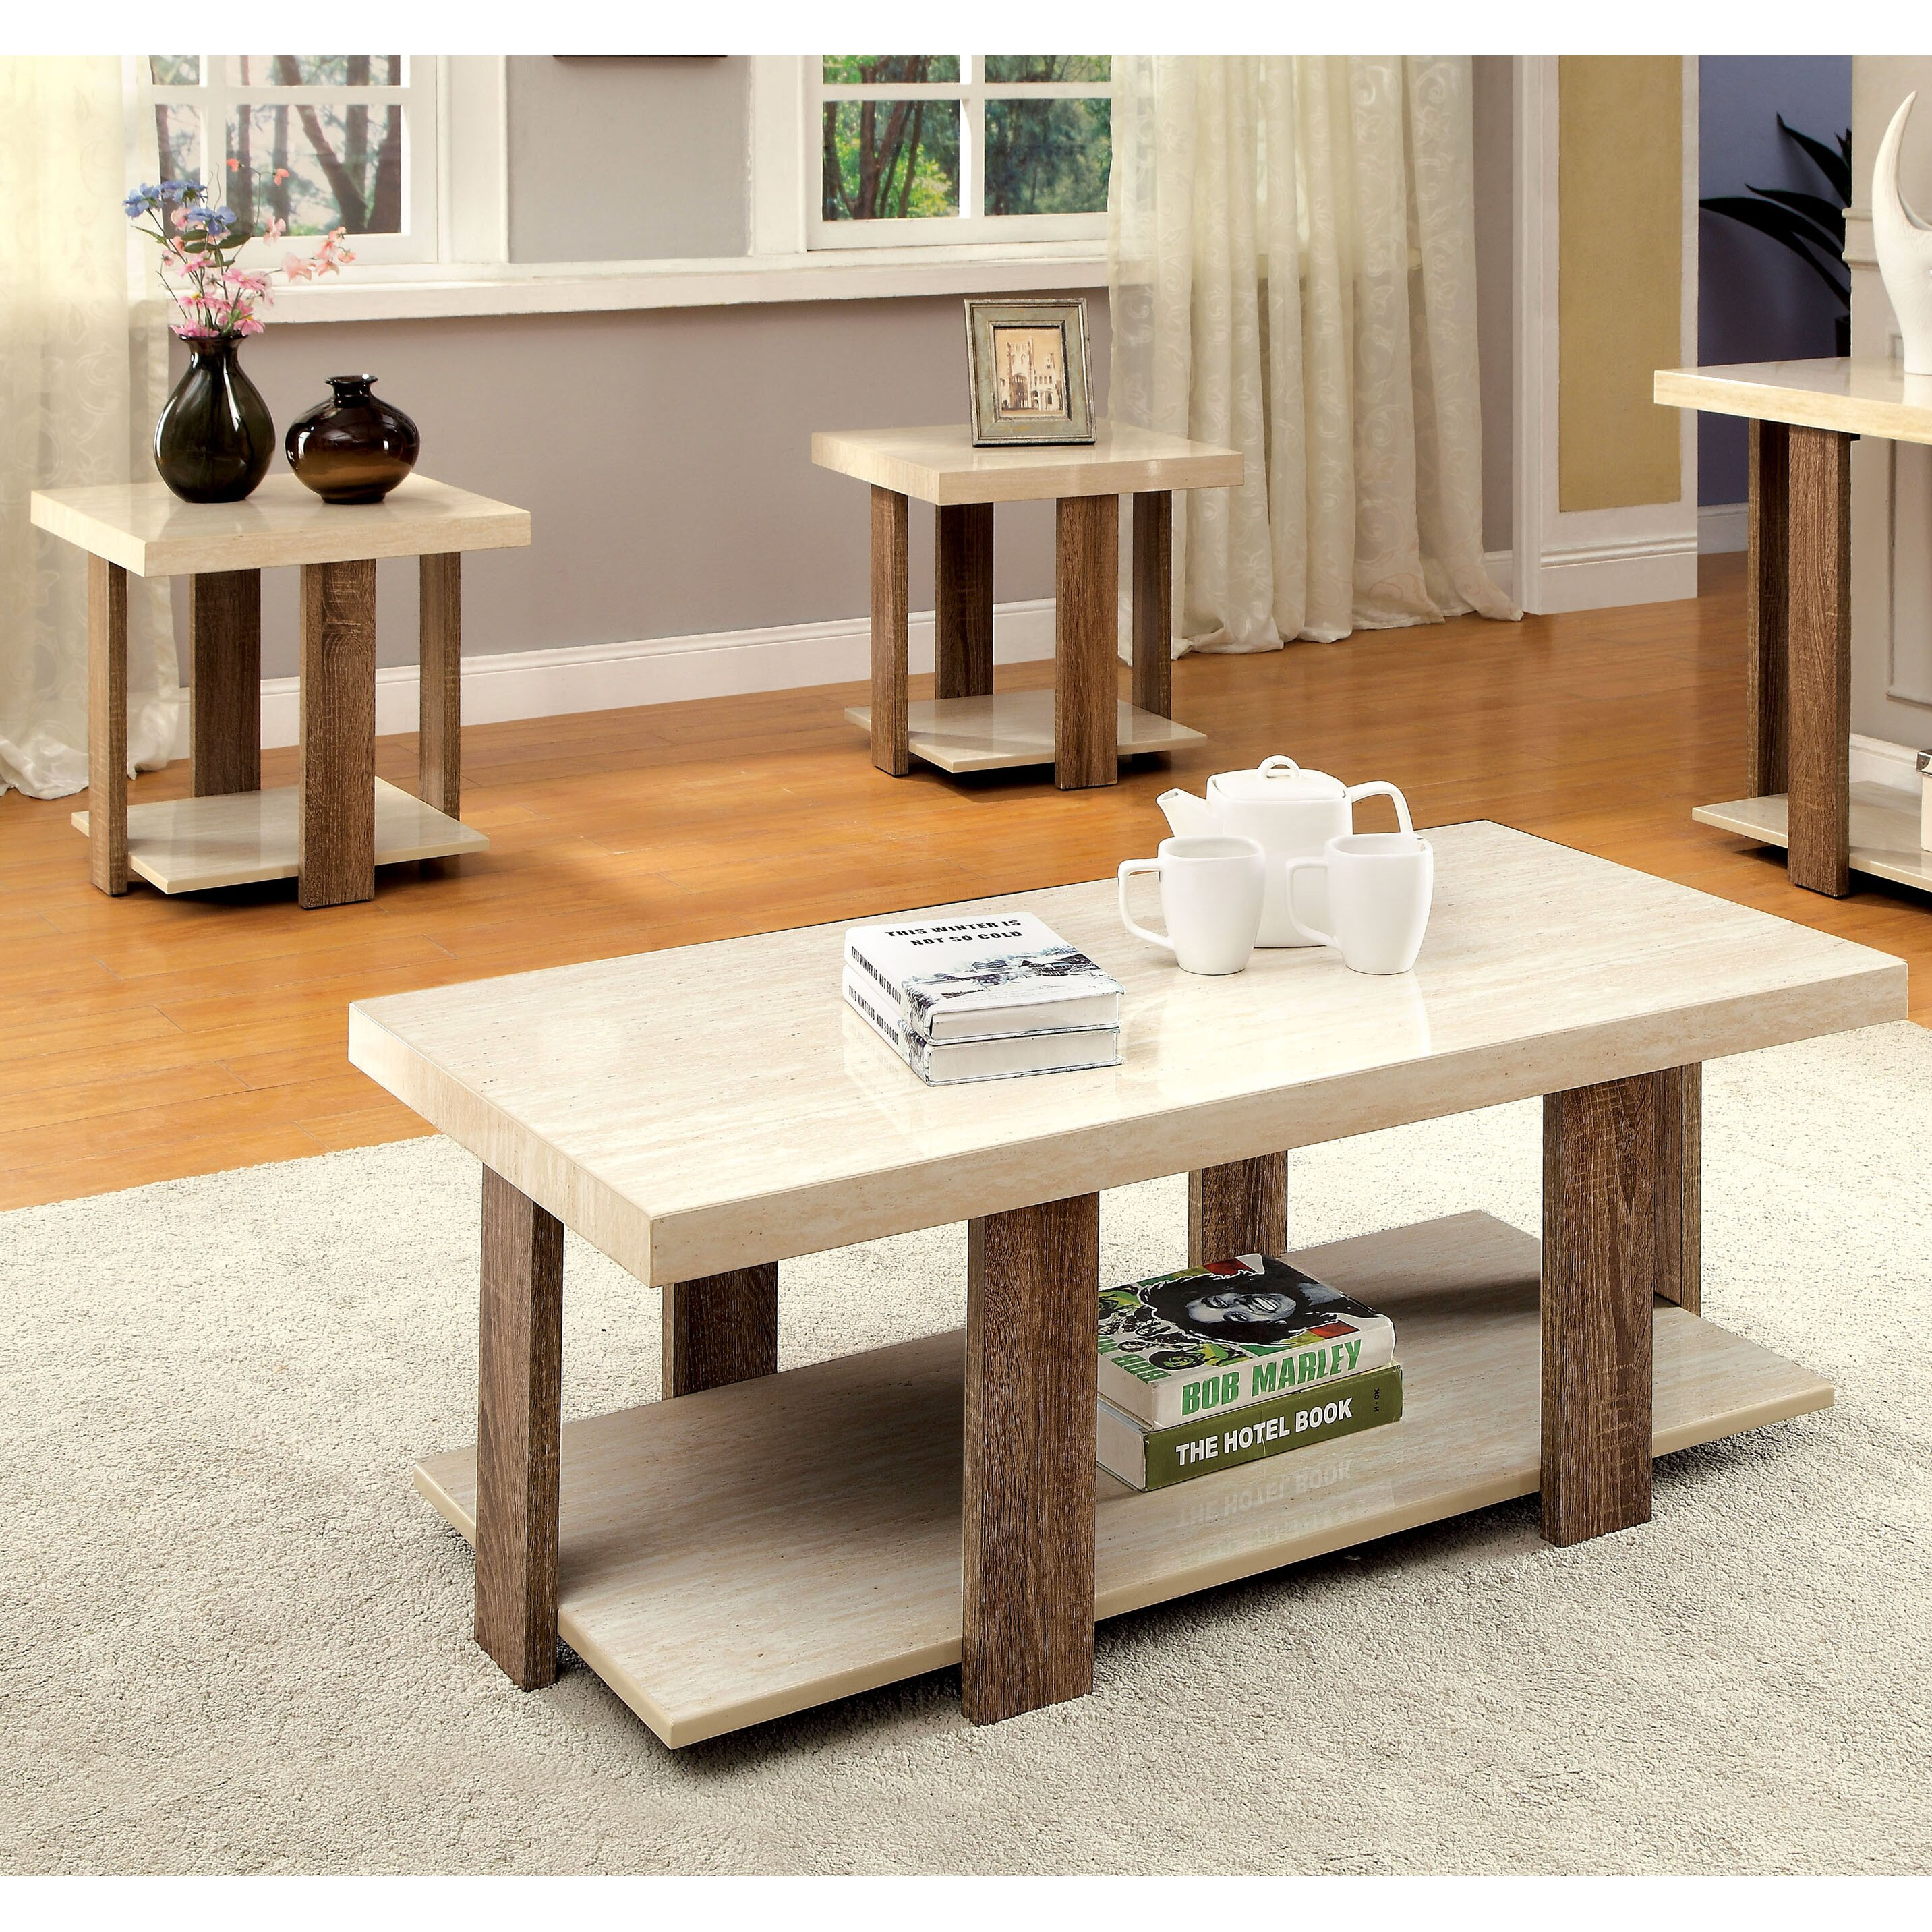 Three Piece Living Room Table Set Wade Logan Dunlevy 3 Piece Coffee Table Set Reviews Wayfair